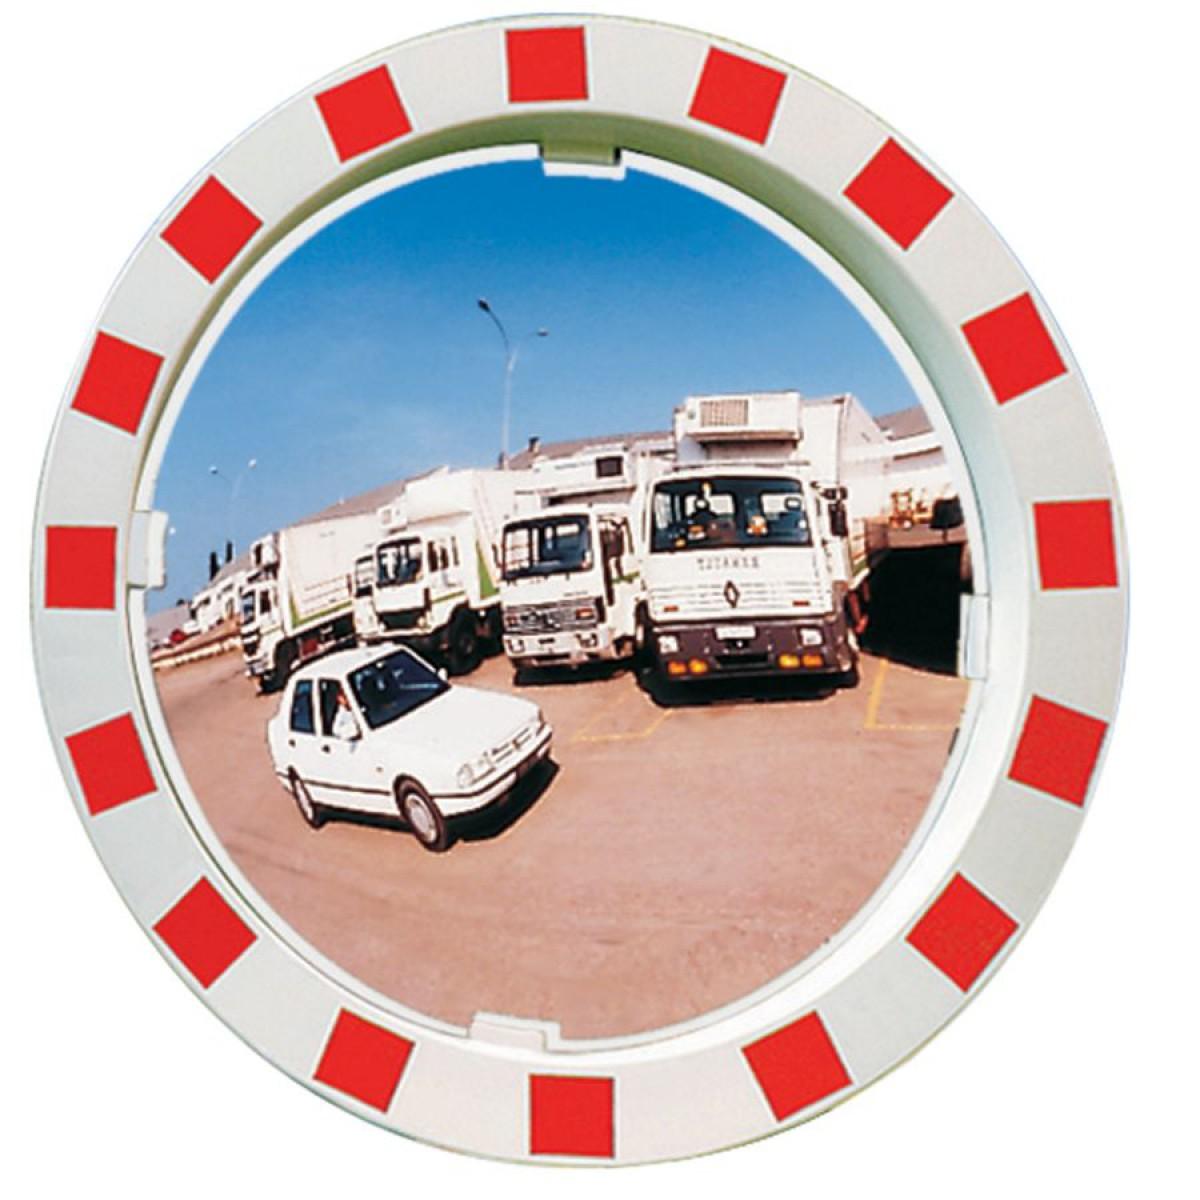 Miroir industrie int rieur ext rieur 750 mm hse center for Miroir industrie